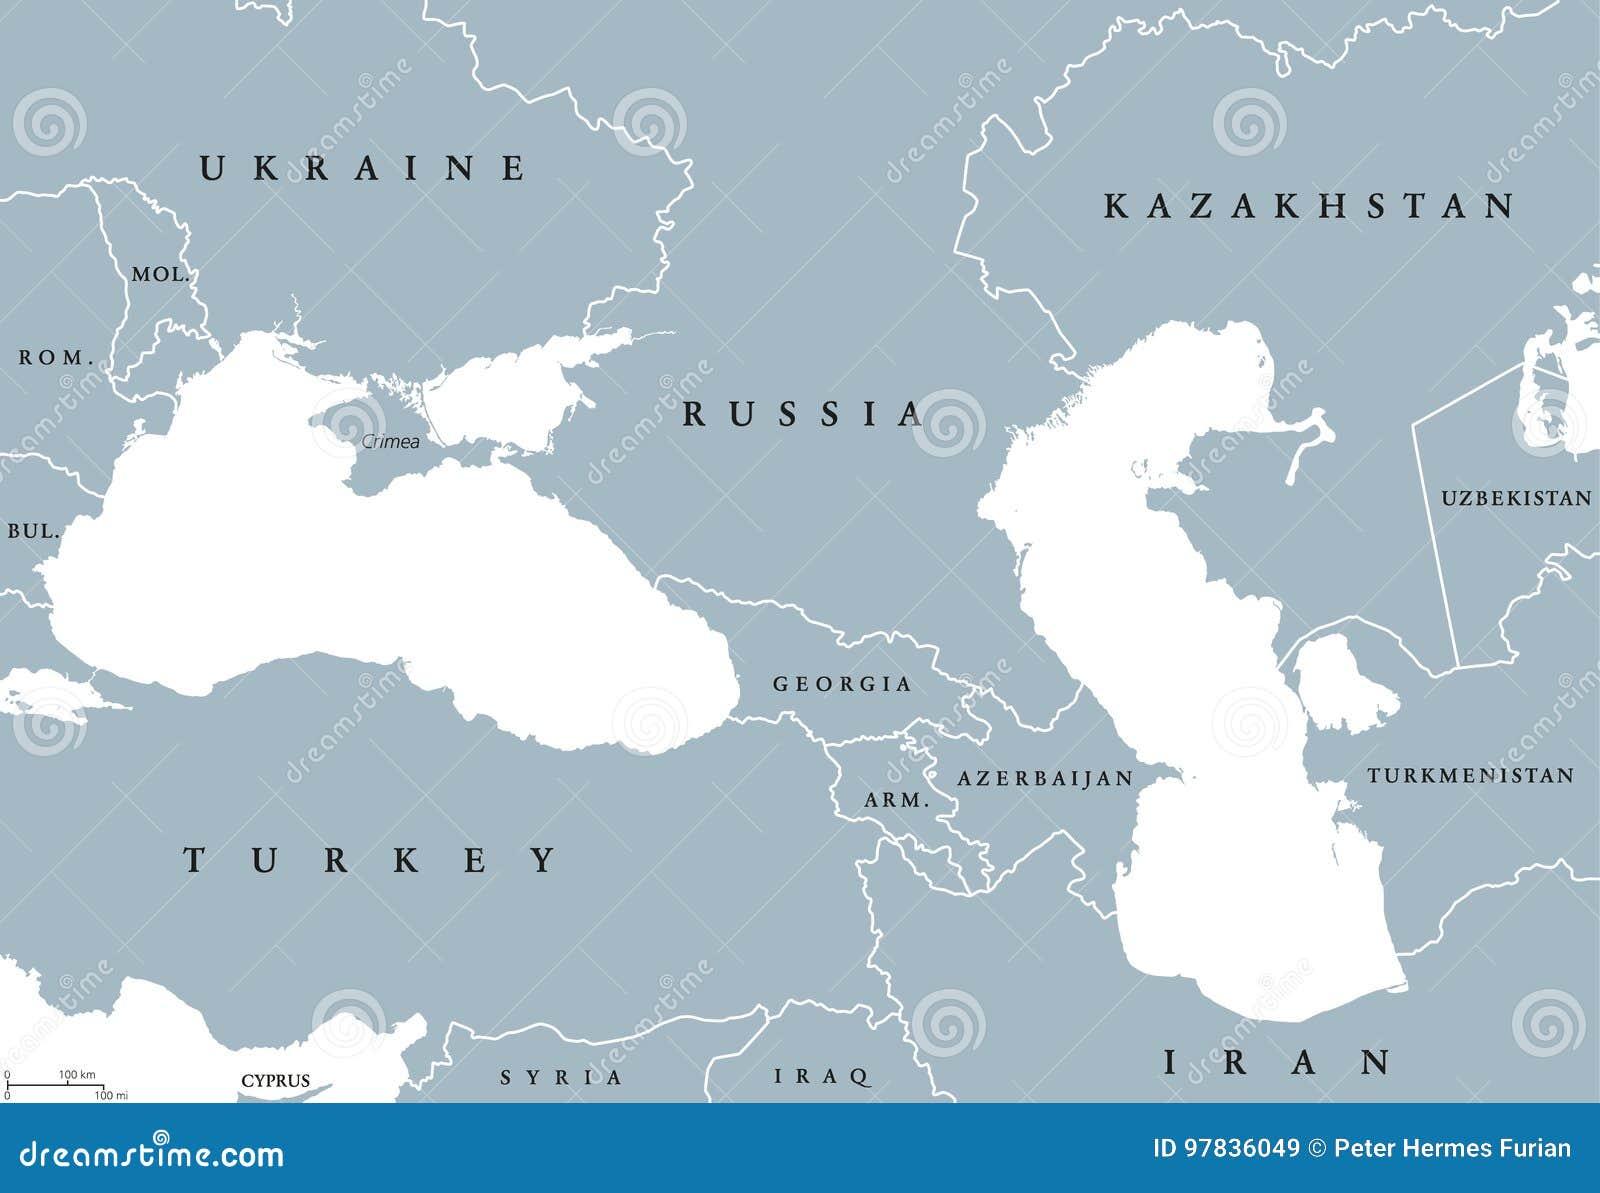 Black Sea And Caspian Sea Region Political Map Stock Vector ...